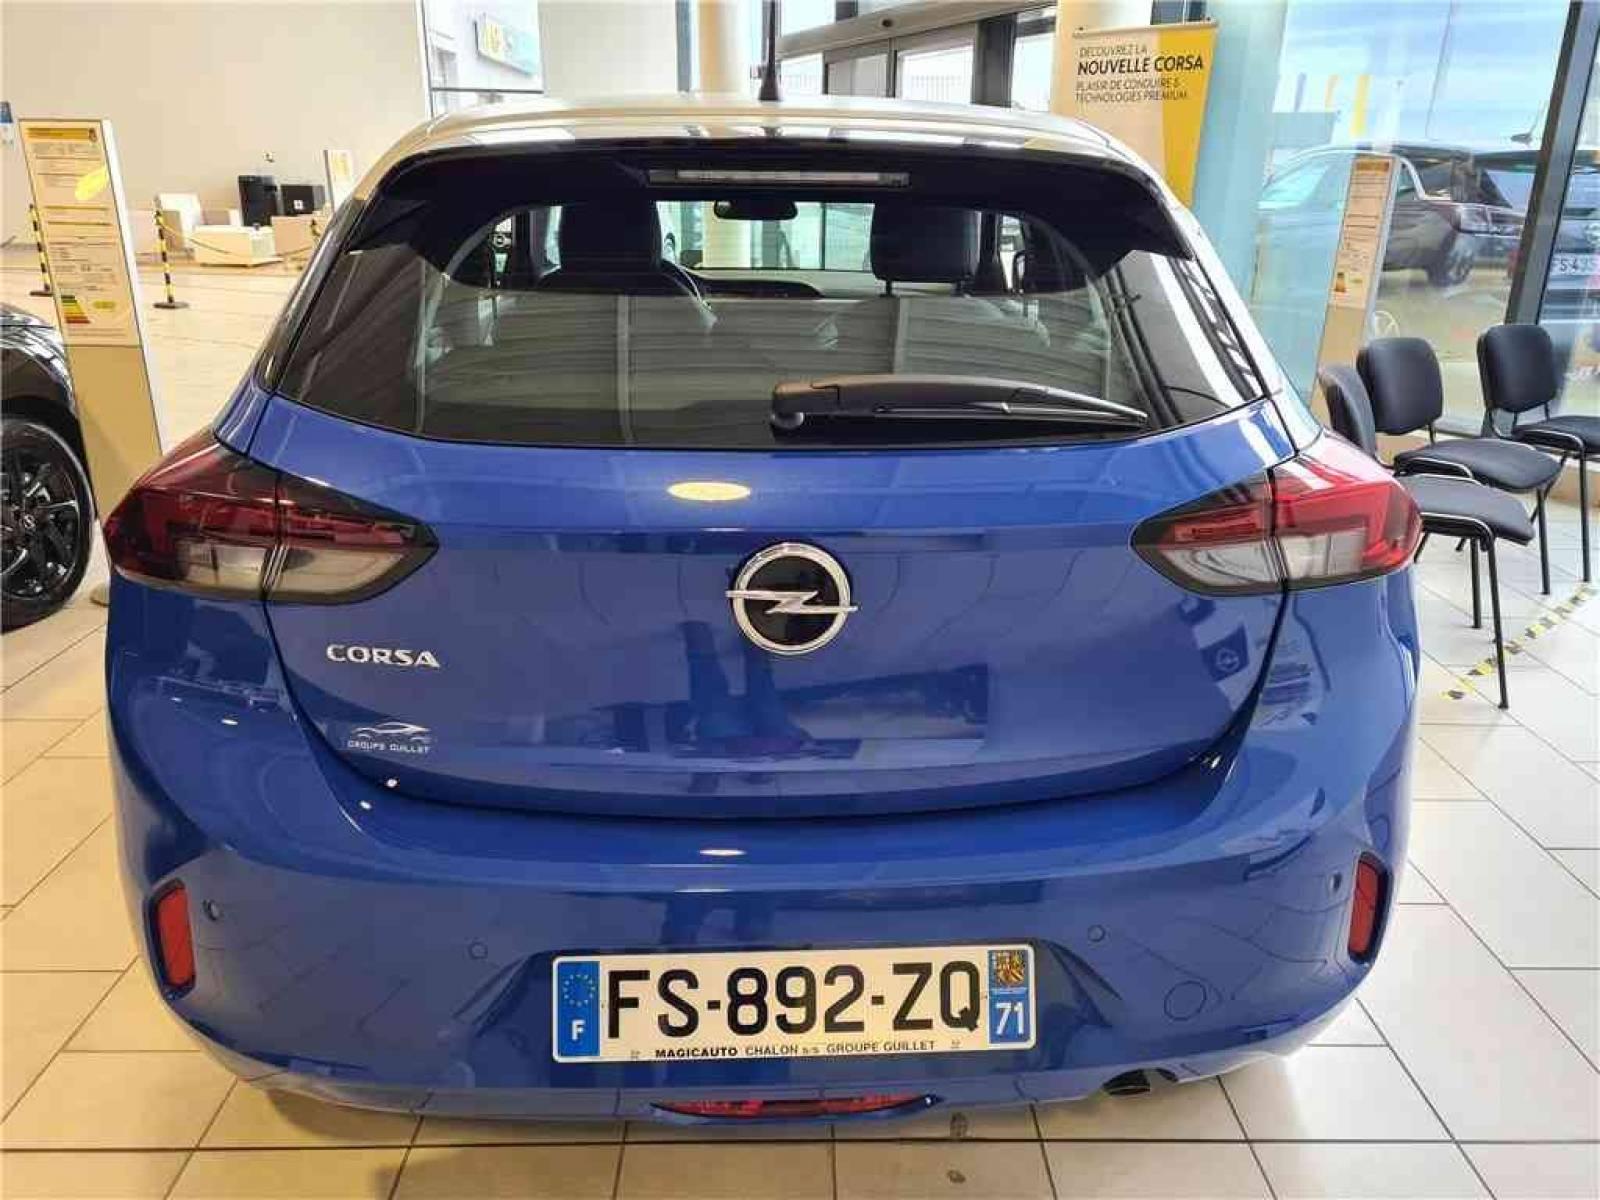 OPEL Corsa 1.2 Turbo 100 ch BVM6 - véhicule d'occasion - Groupe Guillet - Opel Magicauto - Chalon-sur-Saône - 71380 - Saint-Marcel - 4